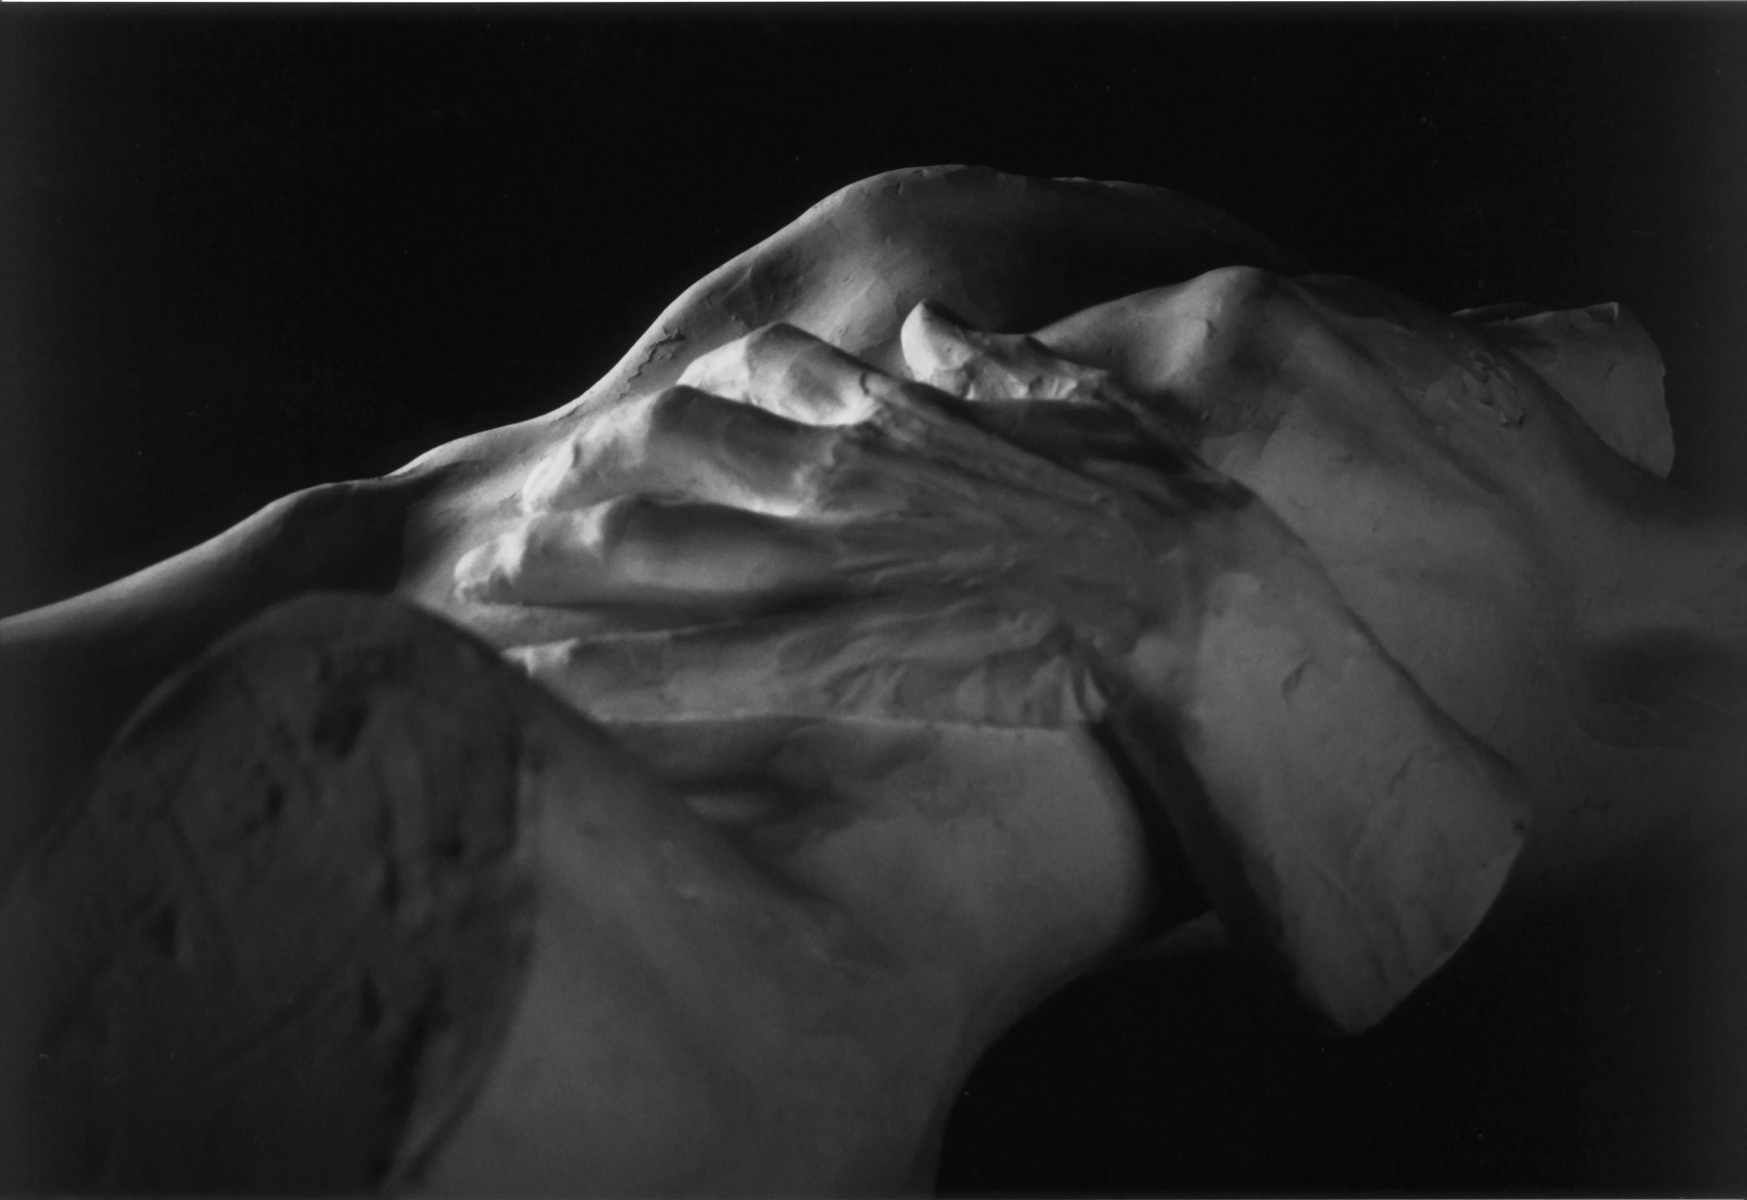 Elena-Mutinelli-17-etra-studio-tommasi